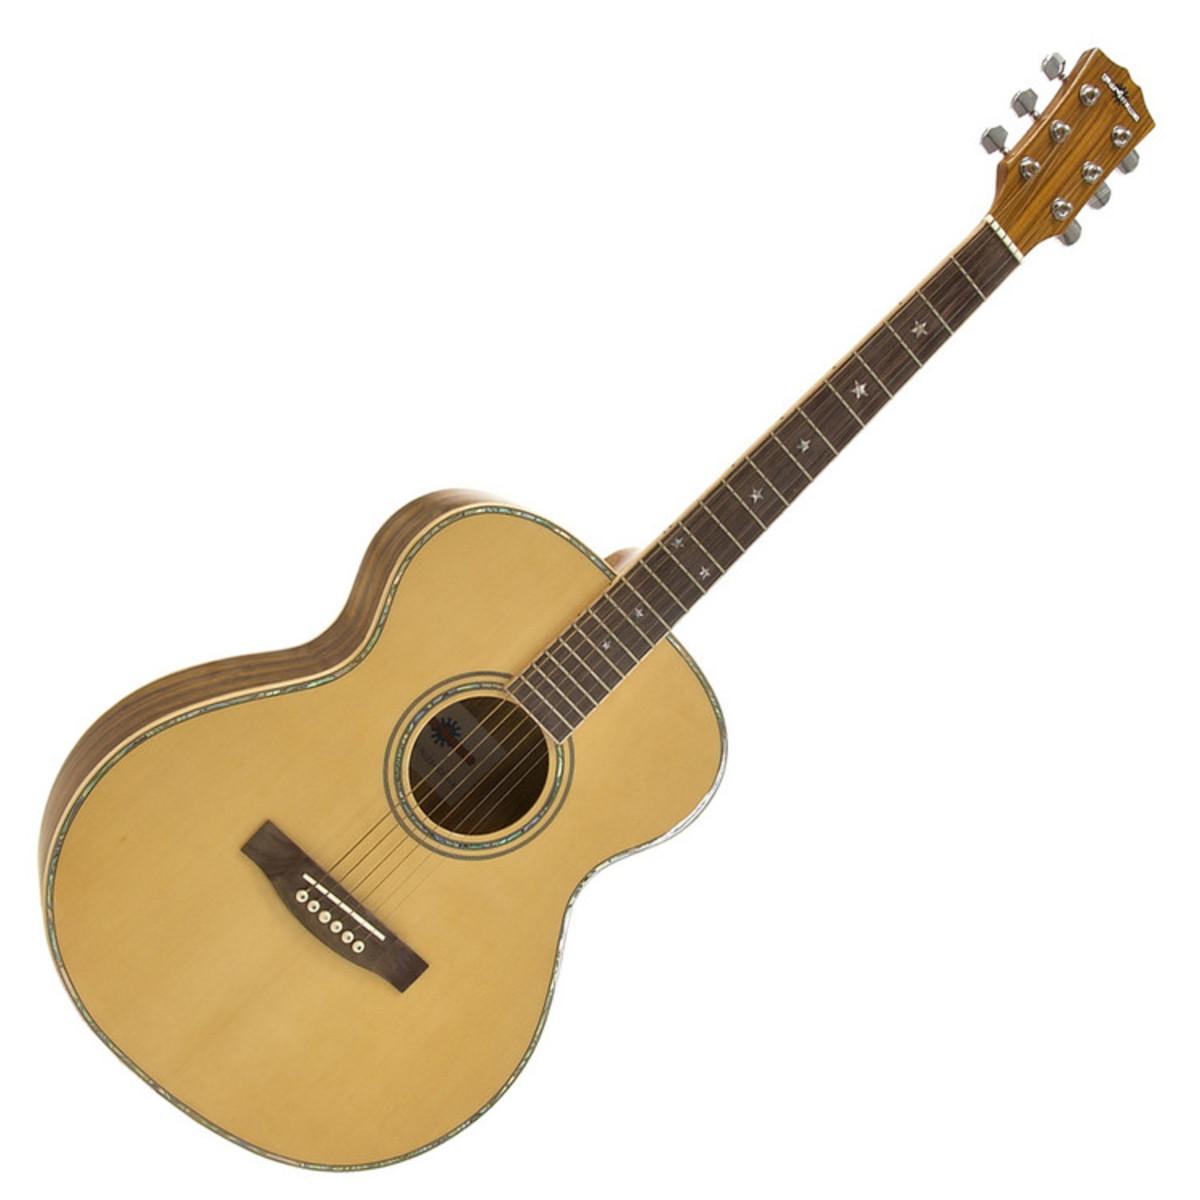 guitare acoustique folk deluxe par gear4music zebrano. Black Bedroom Furniture Sets. Home Design Ideas